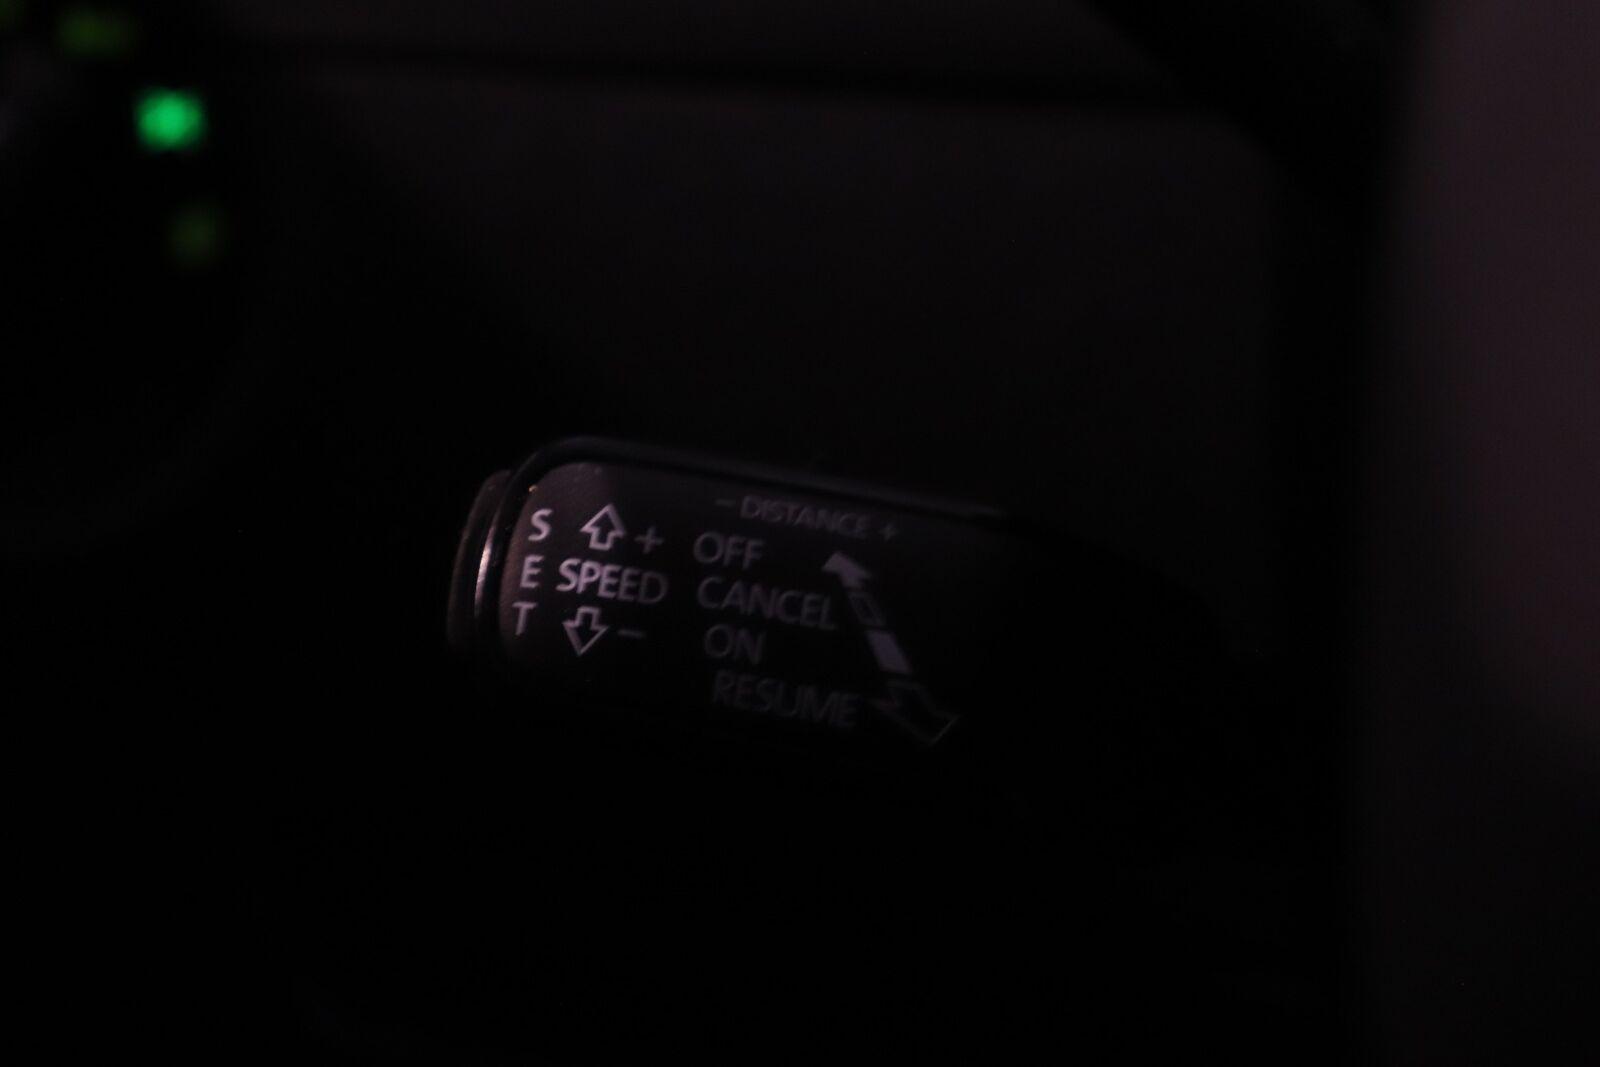 Skoda Octavia TDi 150 Style Combi DSG